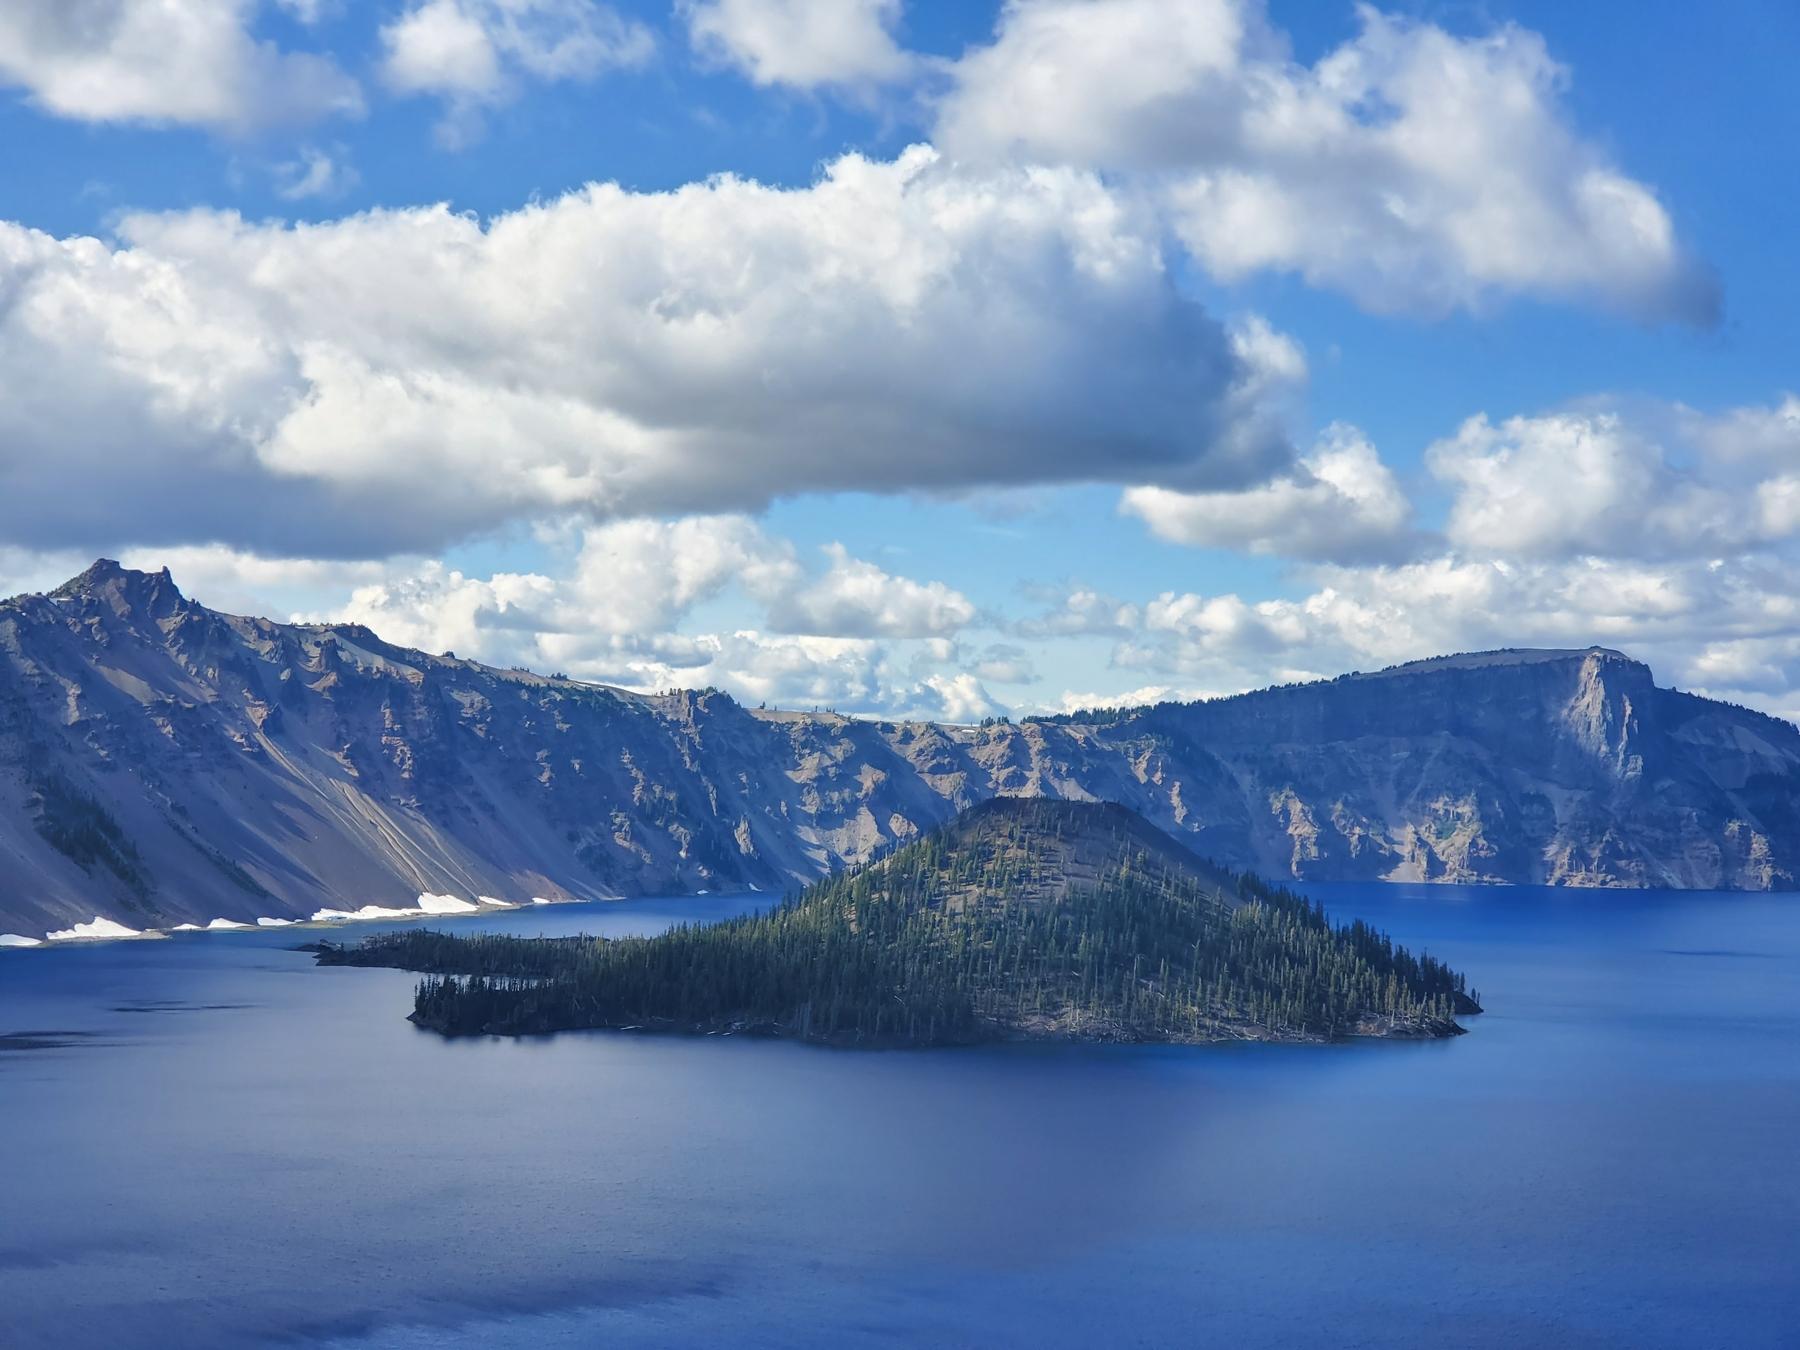 An island inside a blue lake in the Northwest USA